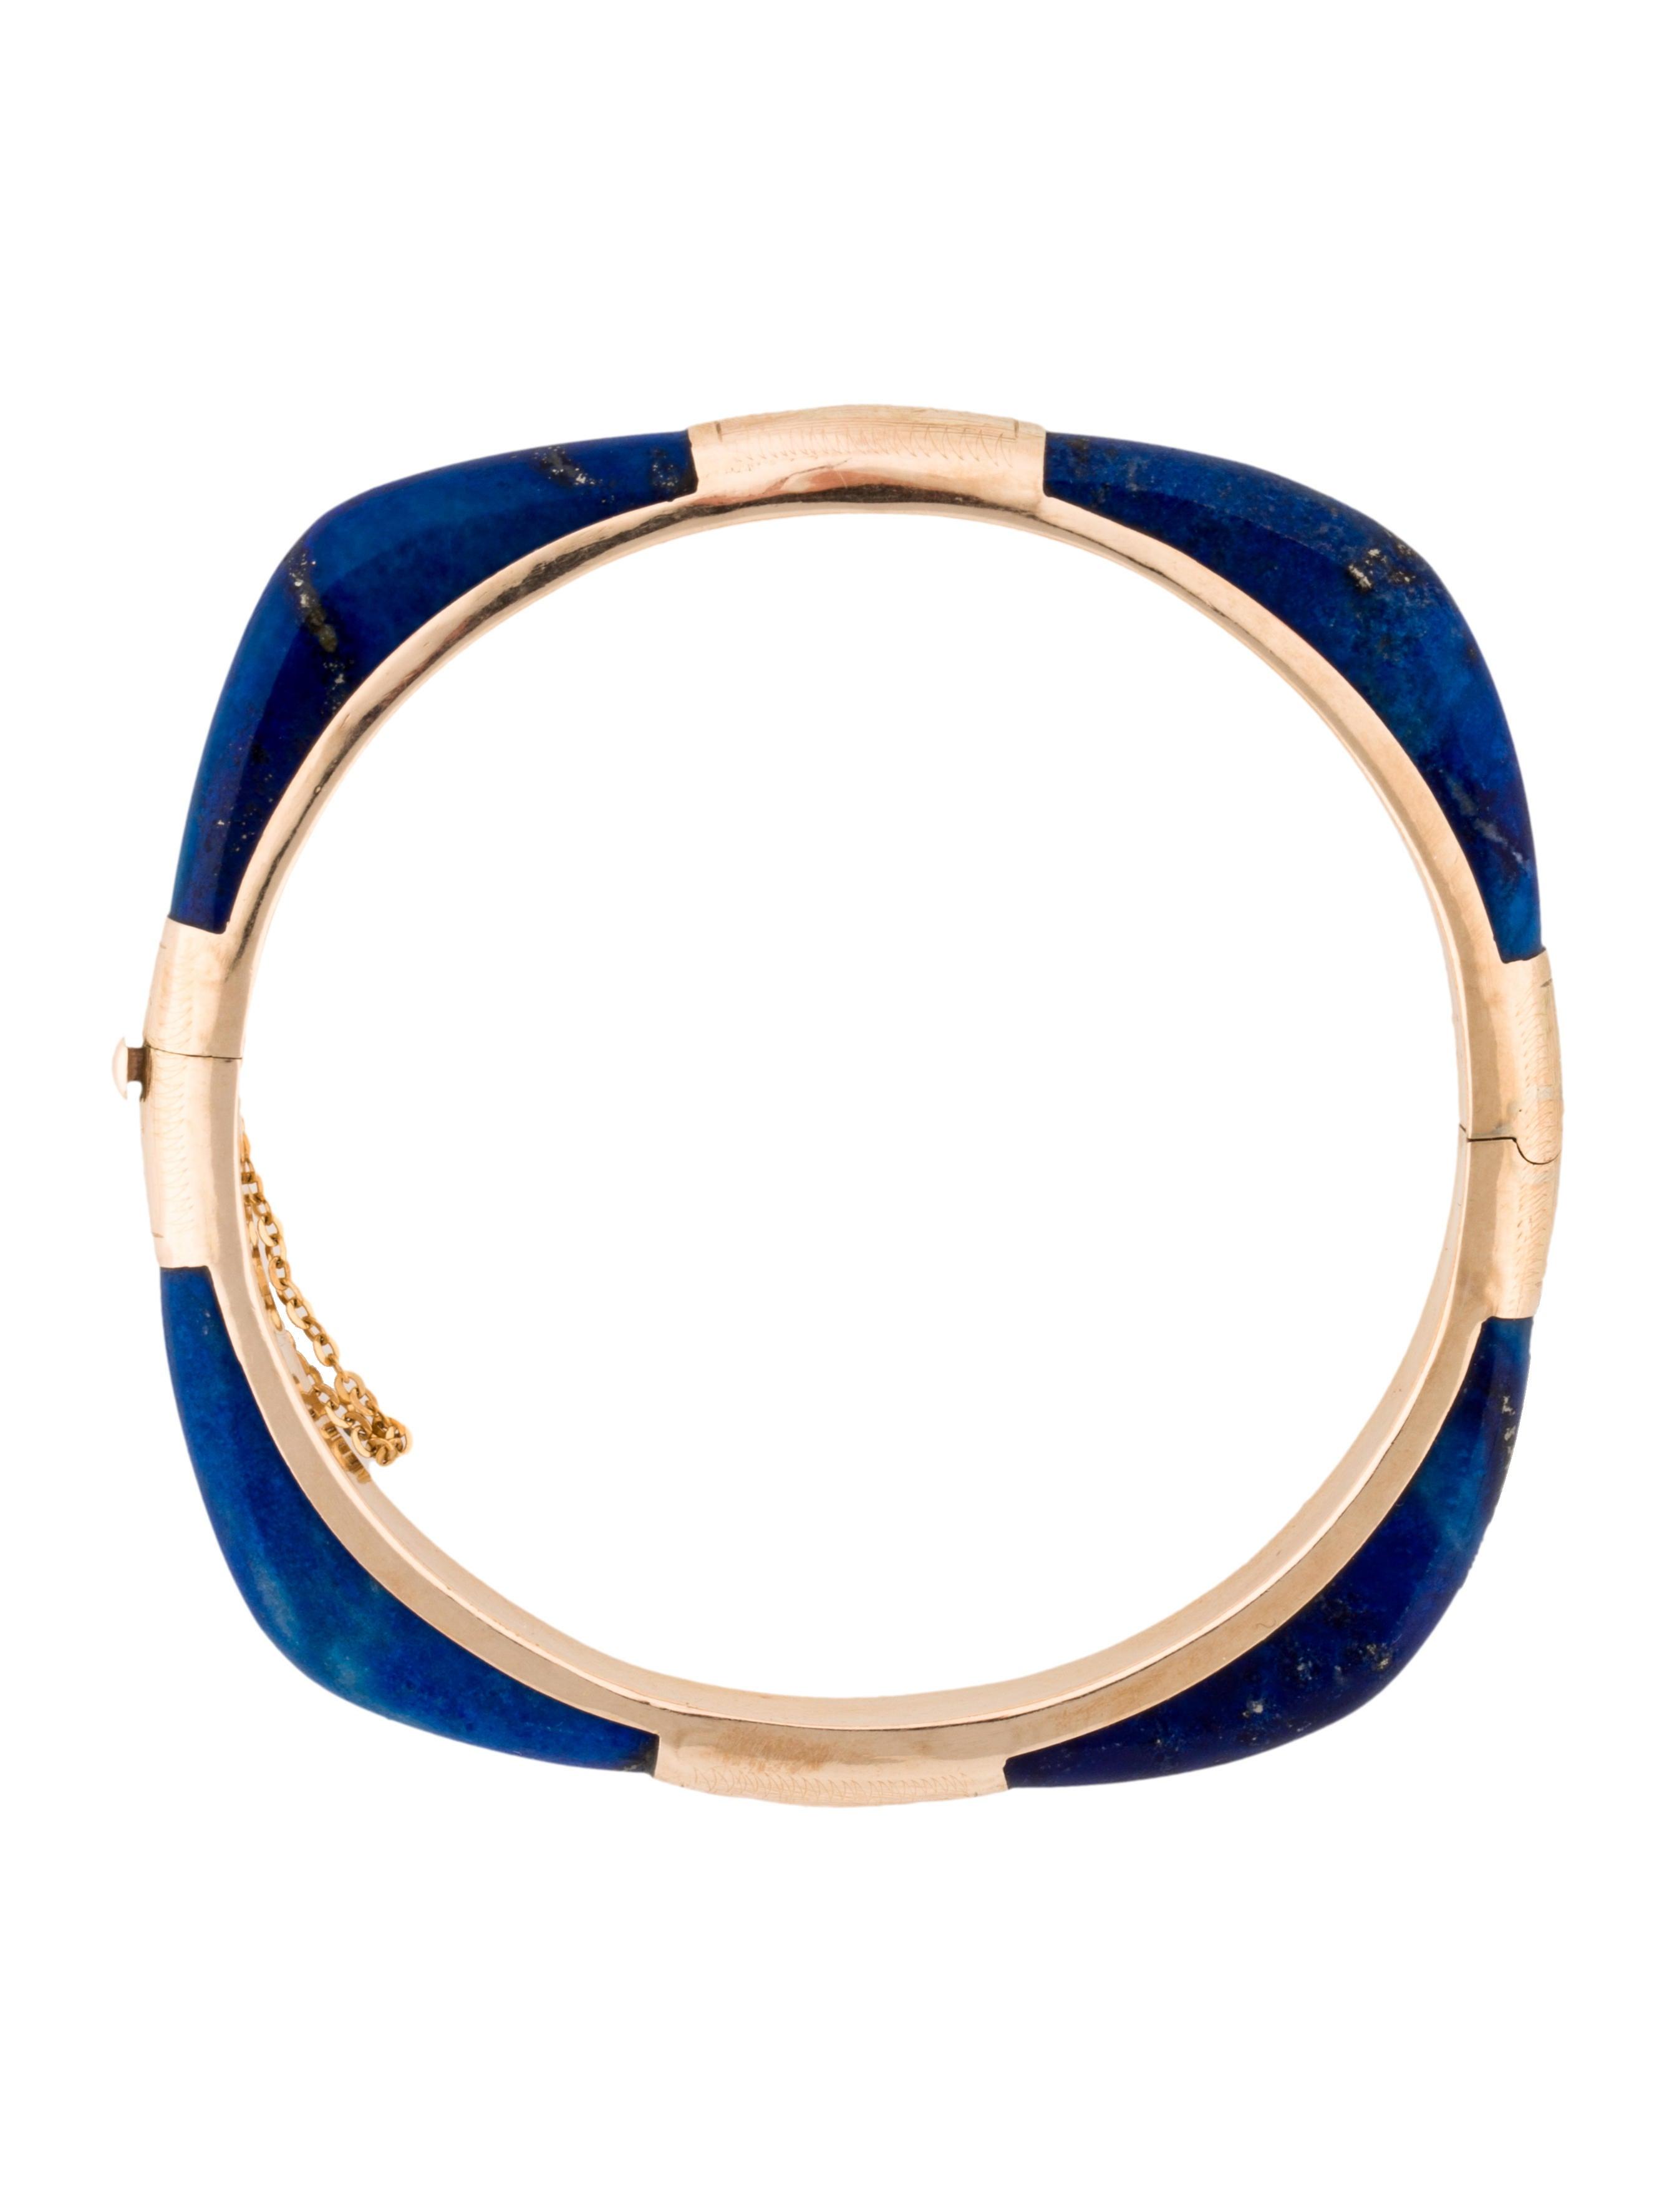 14k lapis lazuli bangle bracelets fjb22378 the realreal. Black Bedroom Furniture Sets. Home Design Ideas